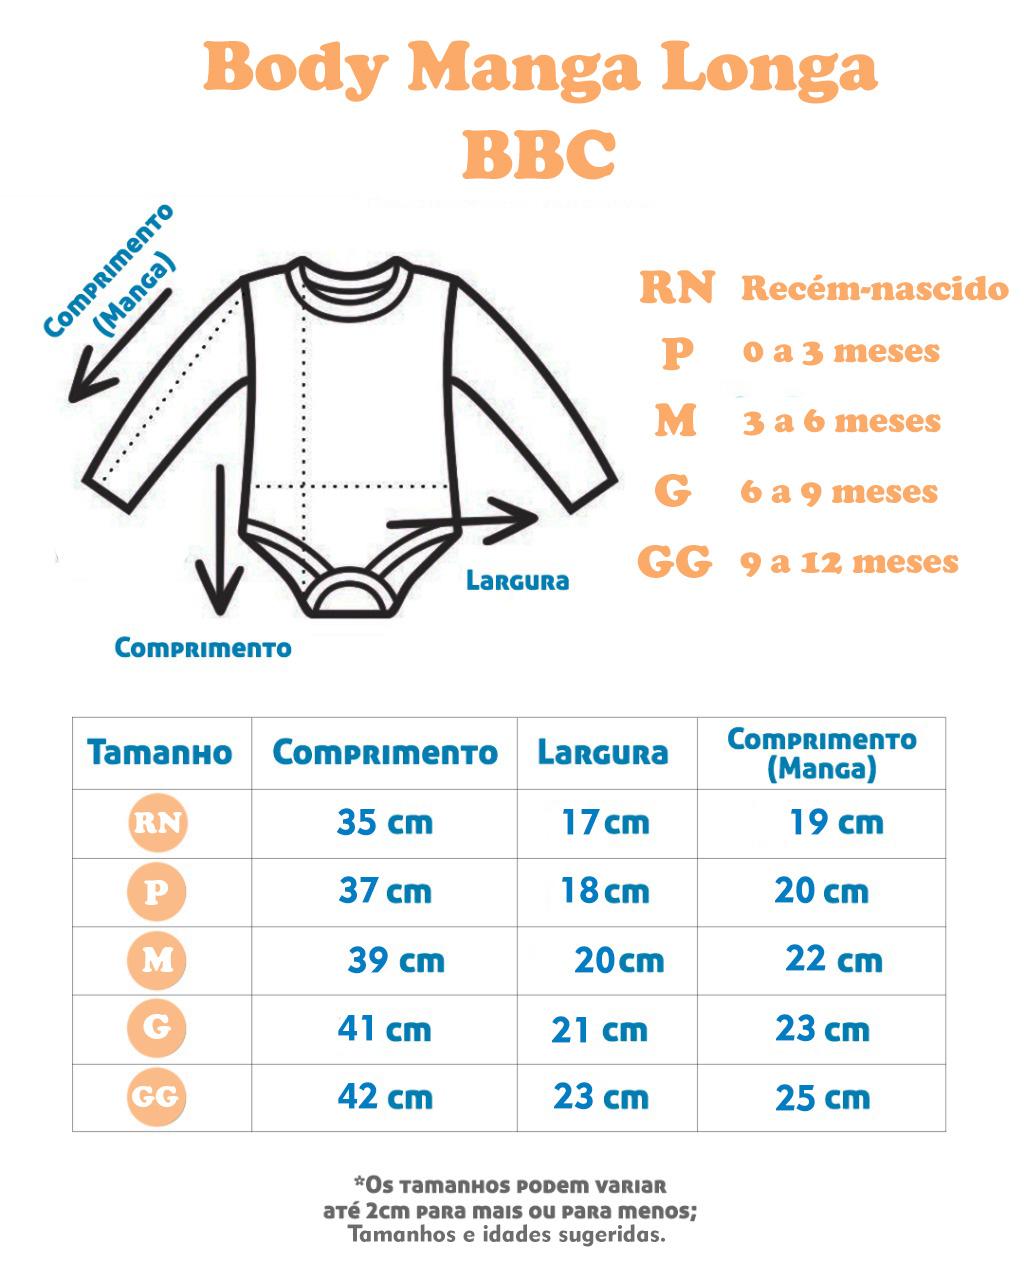 Body Manga Longa Azul Bic Liso (RN/P/M/G/GG)